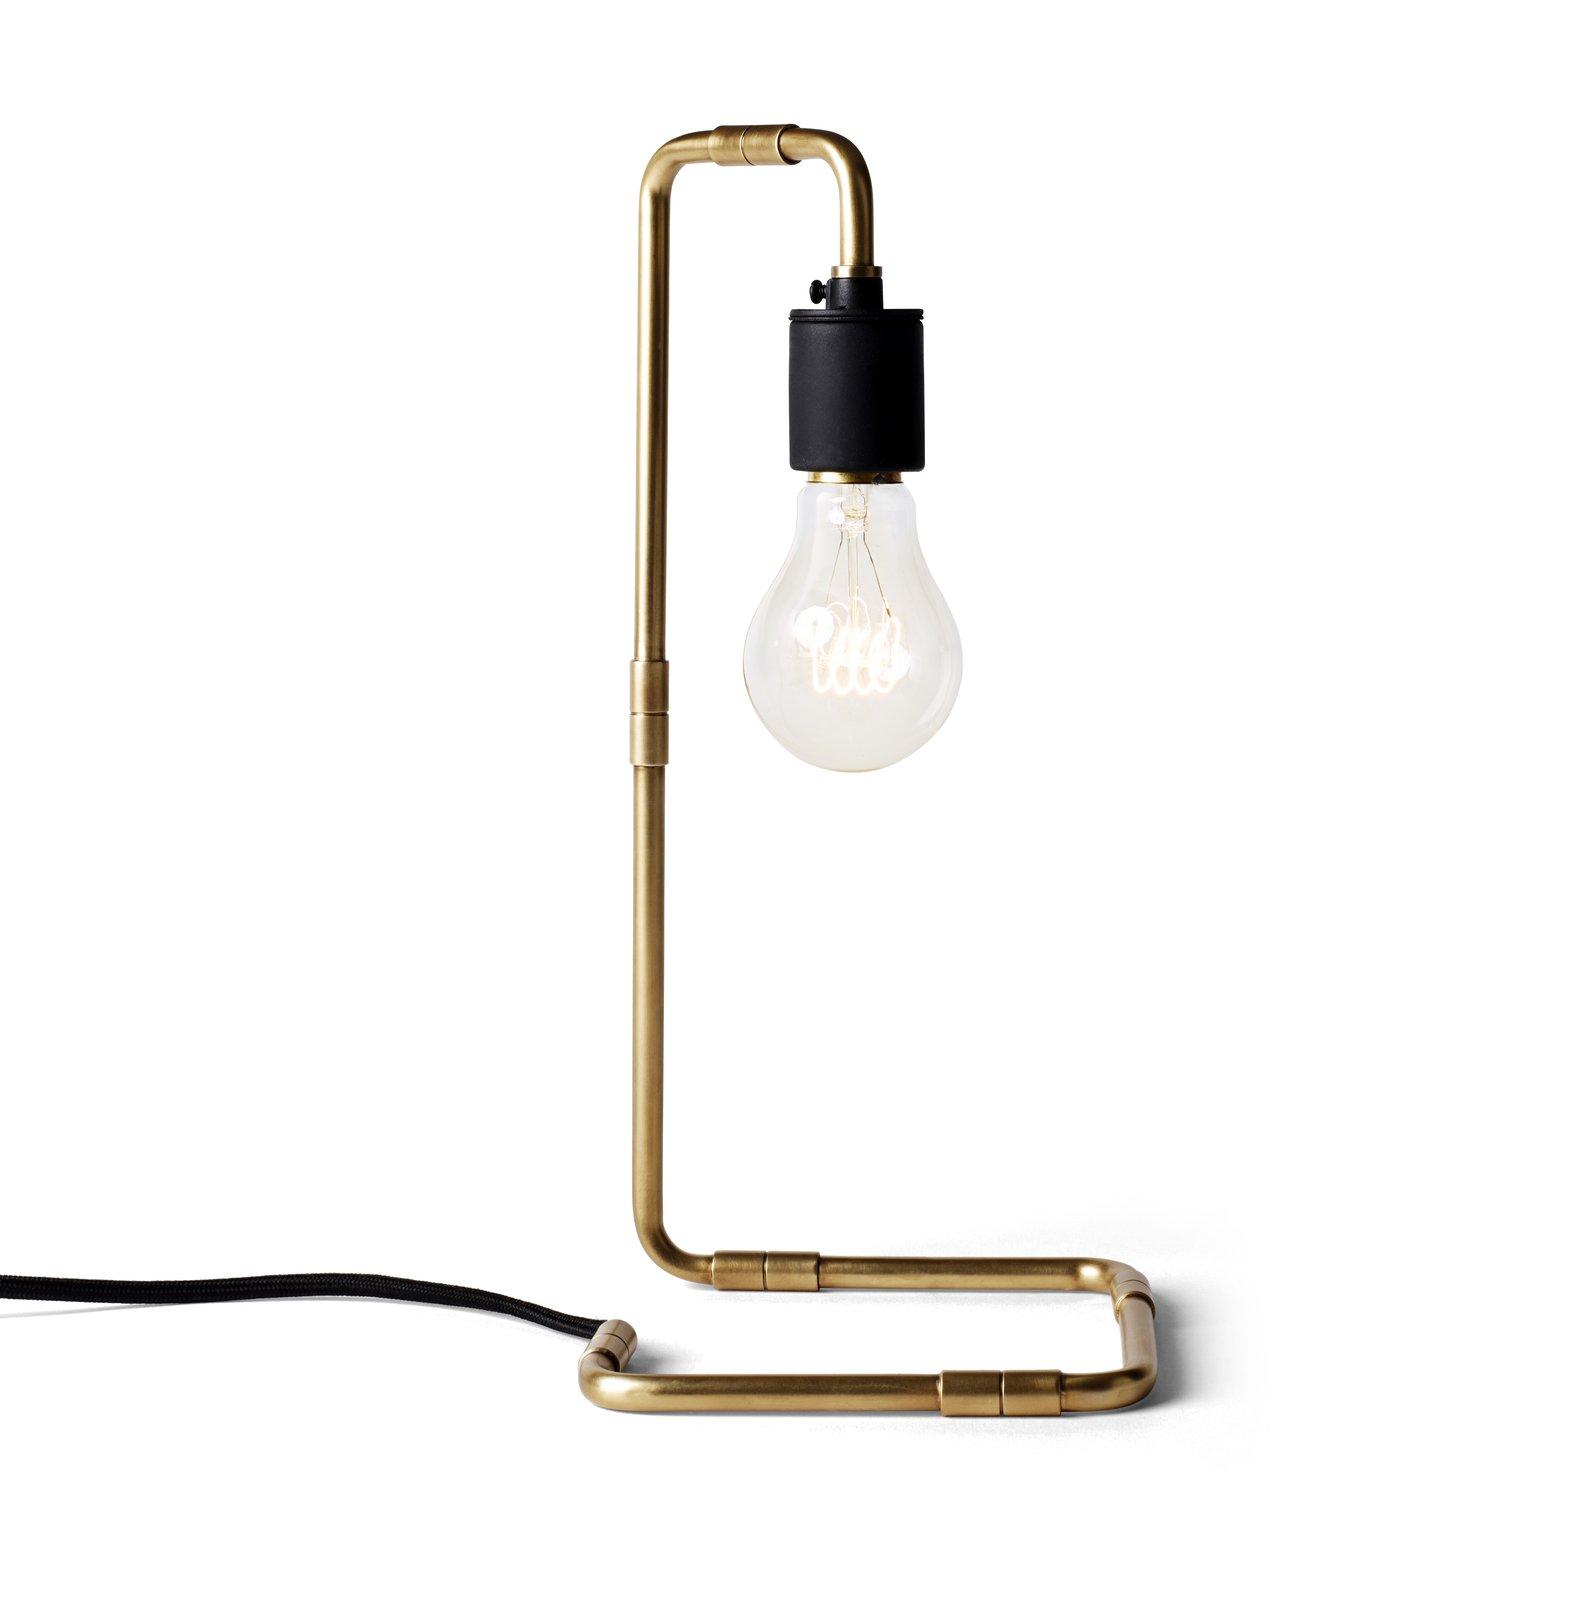 Reade Table Lamp Tribeca Series by Menu